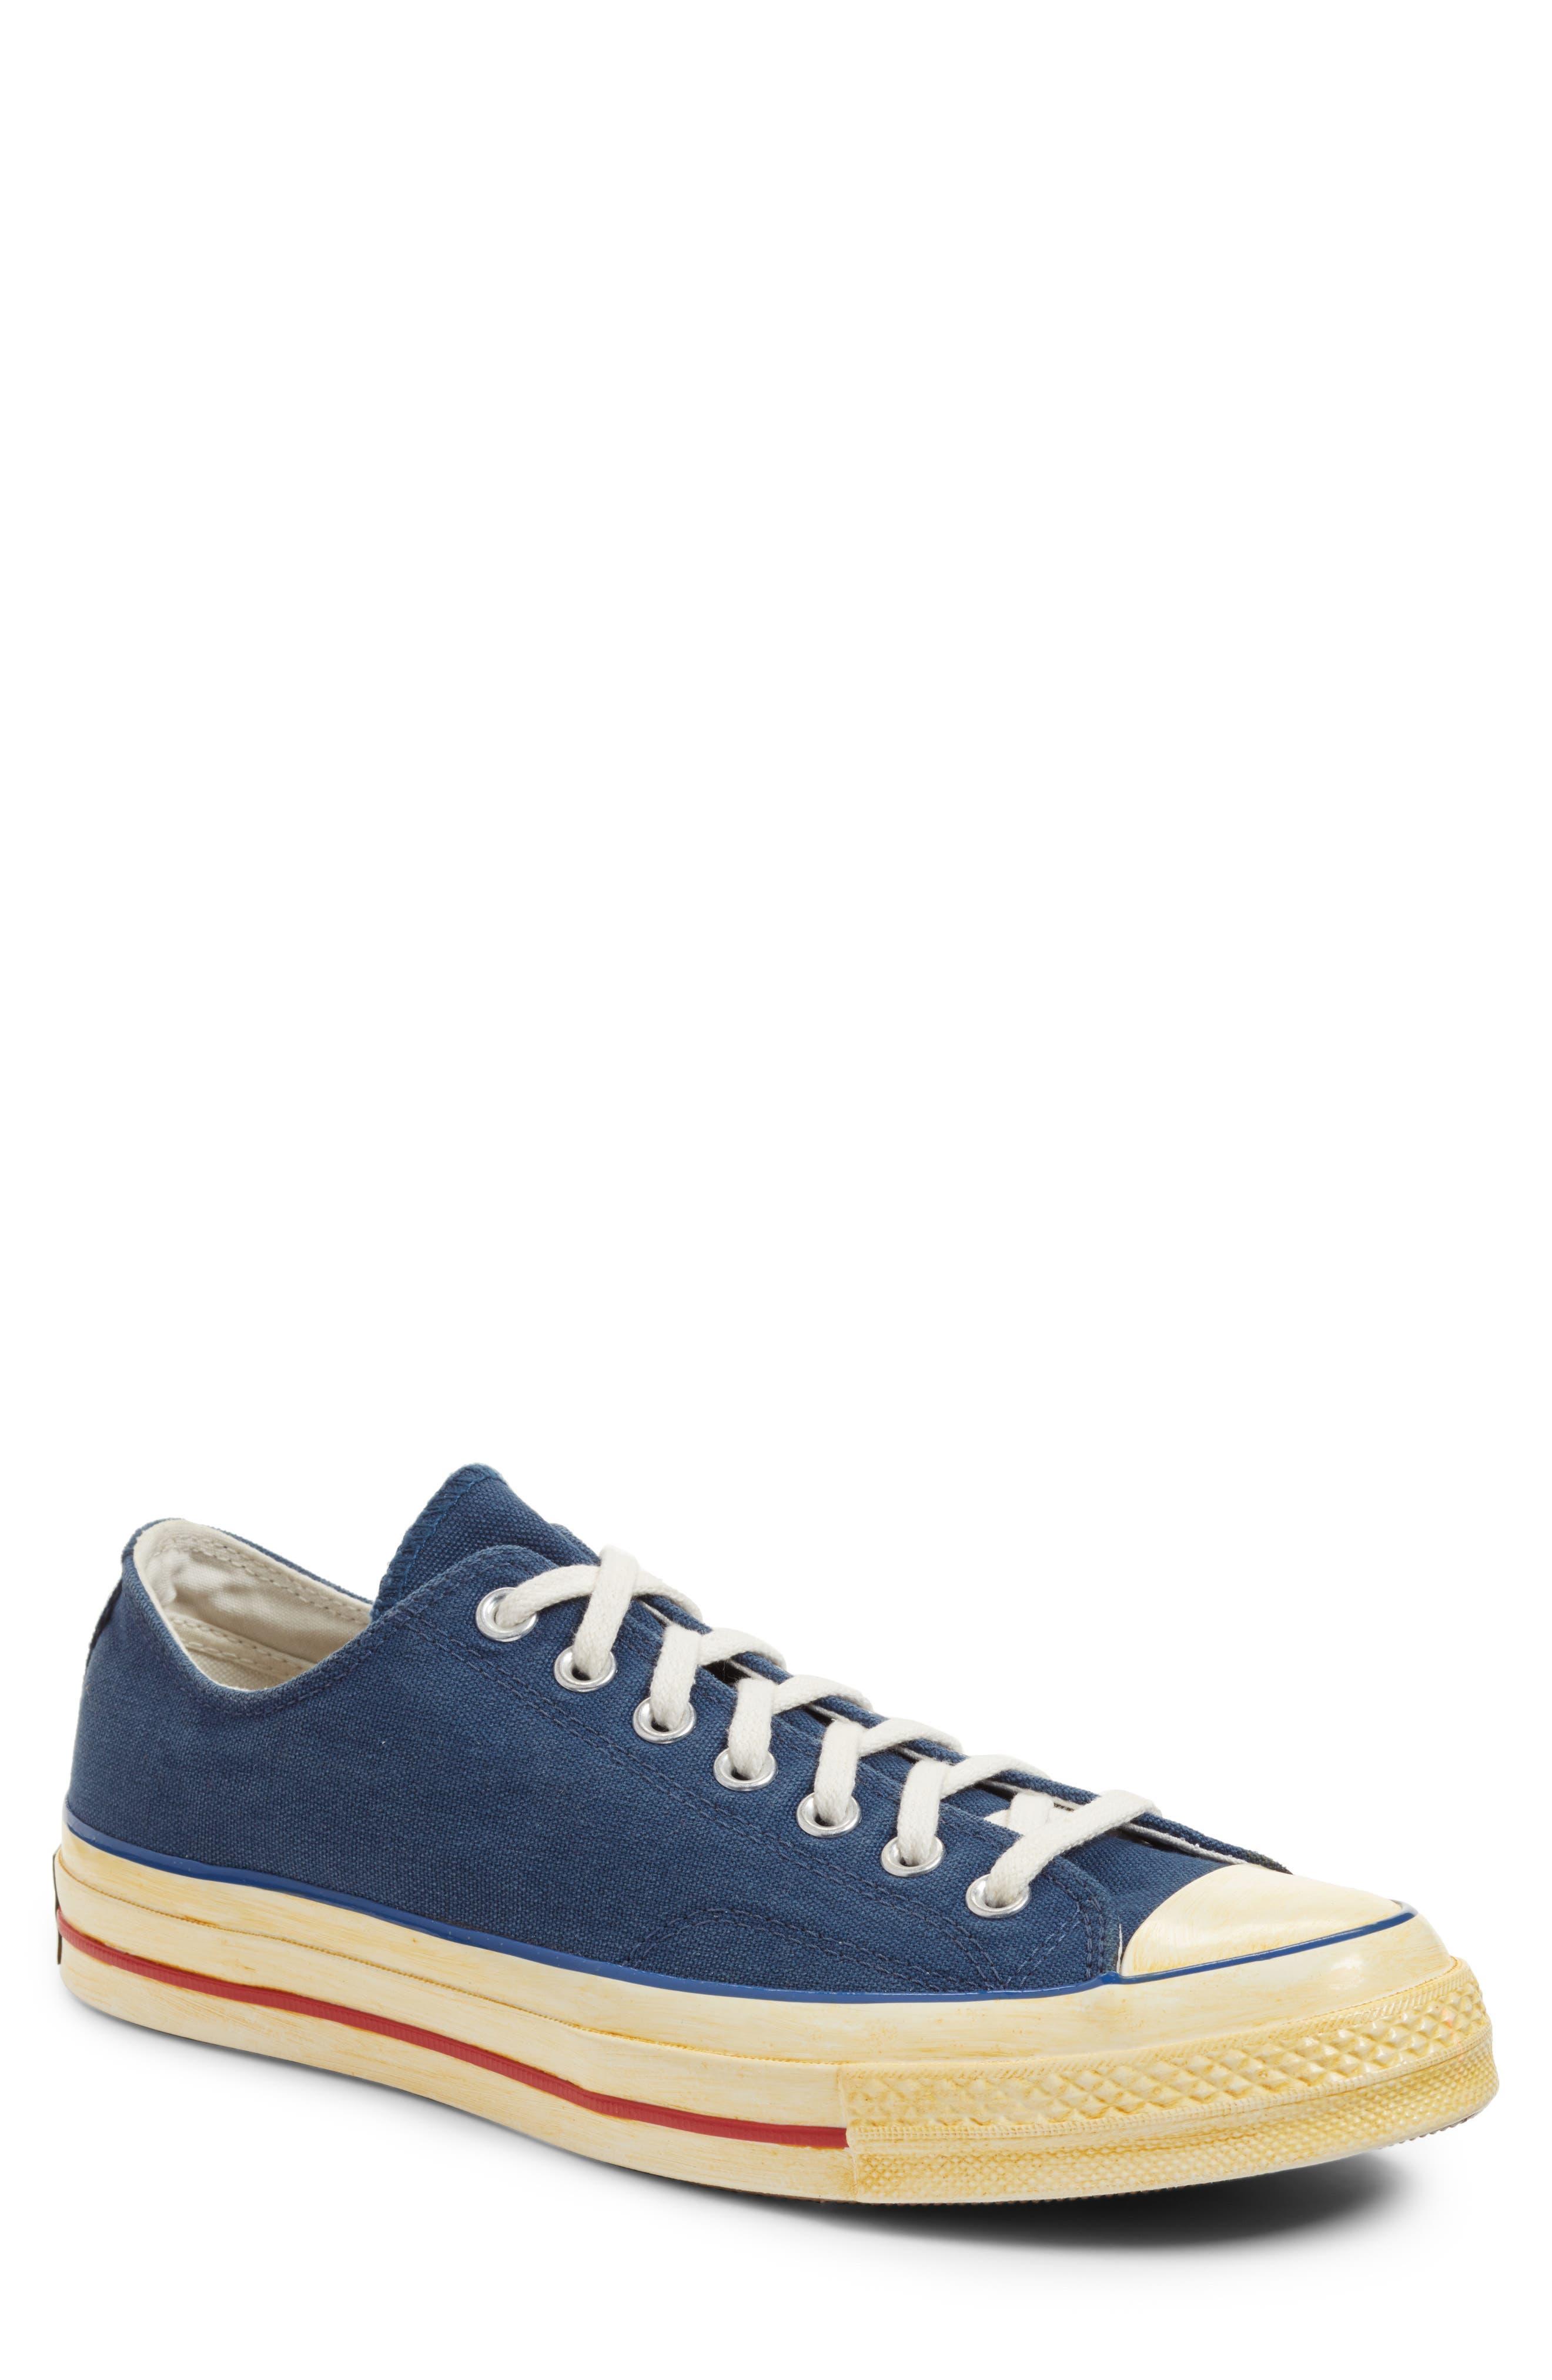 Main Image - Converse Chuck Taylor® All Star® 70 Low Top Sneaker (Men)